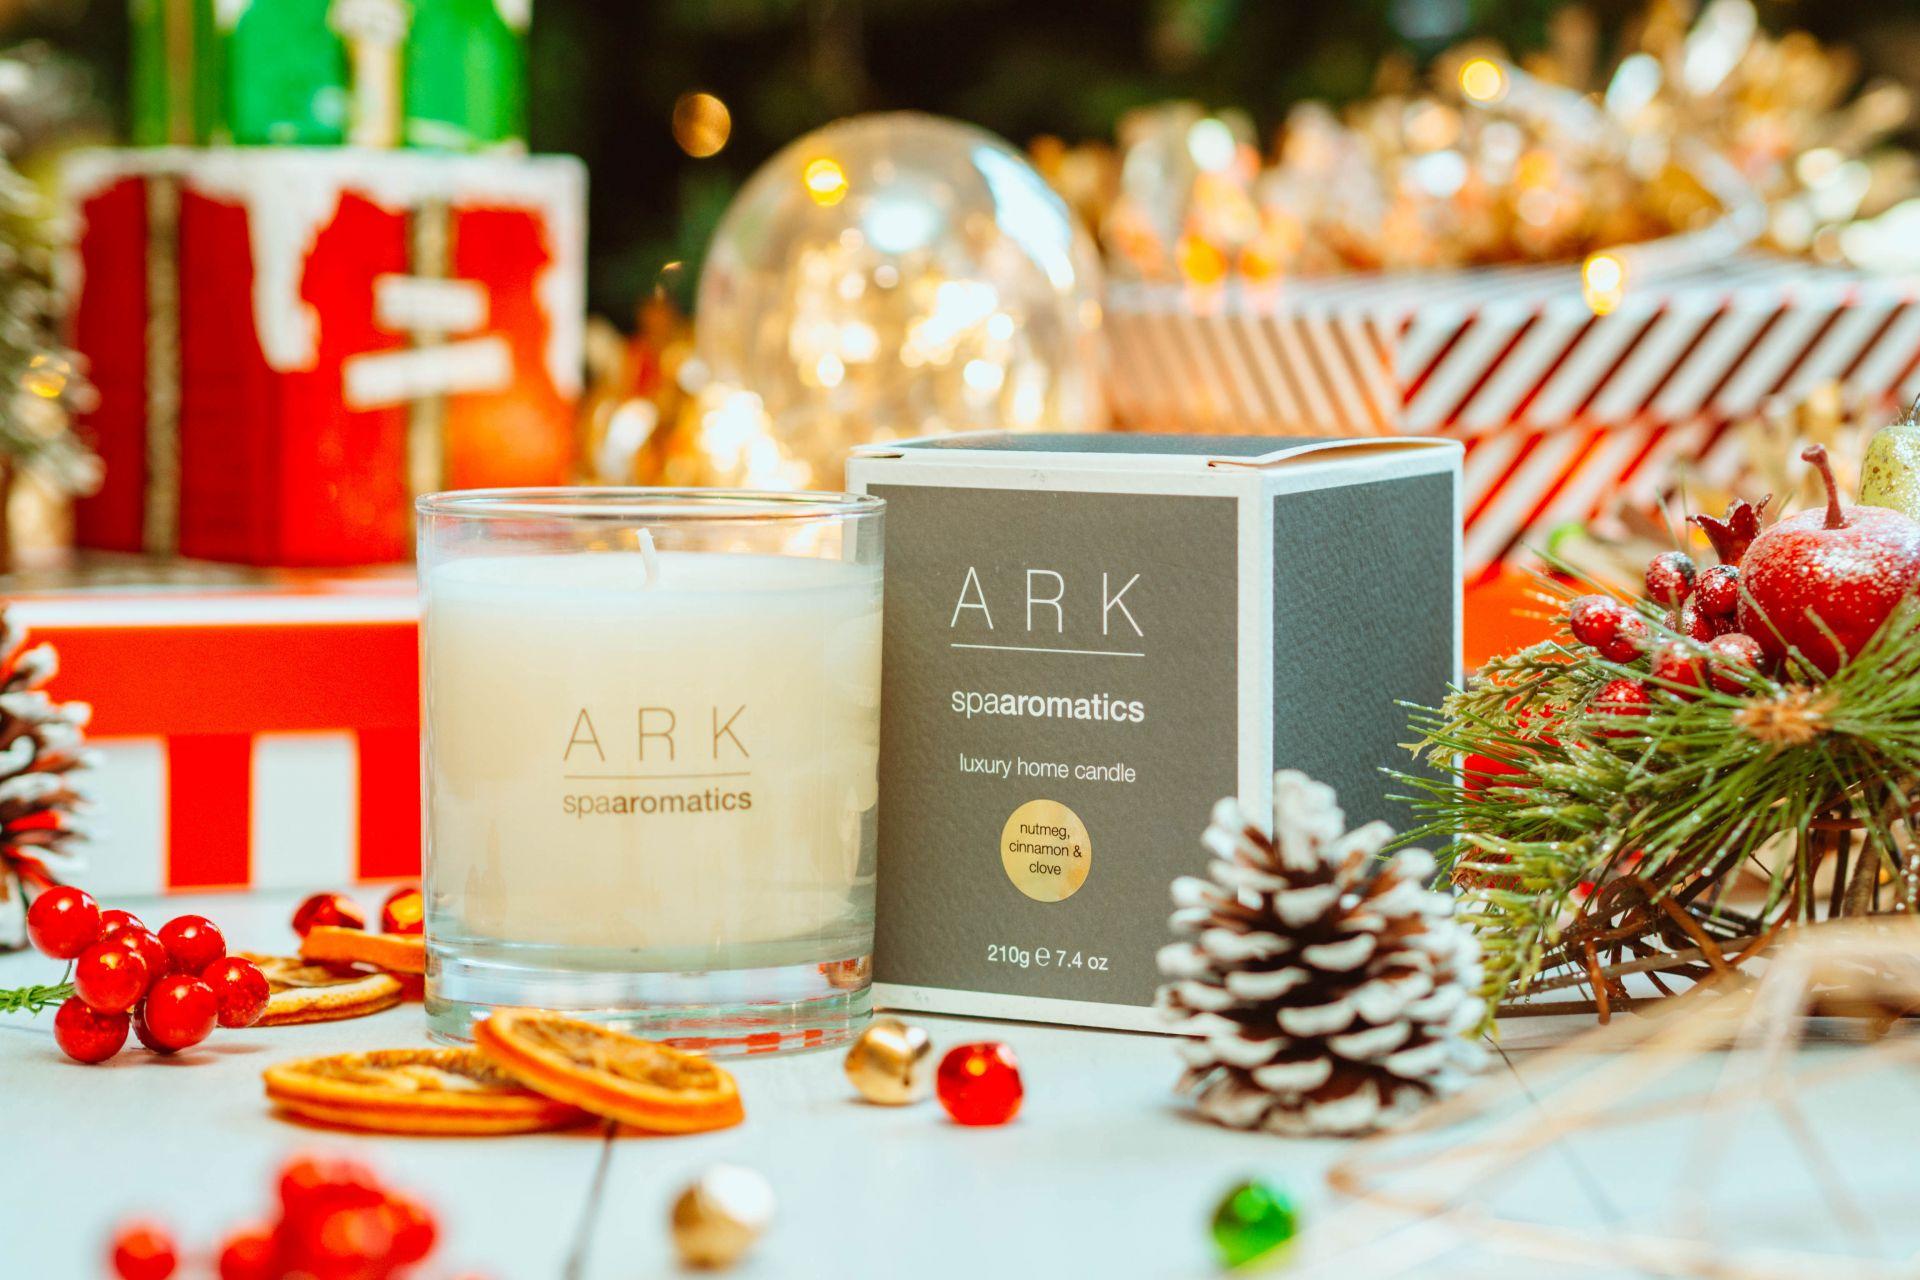 ARK Nutmeg, Cinnamon & Clove Luxury Home Candle